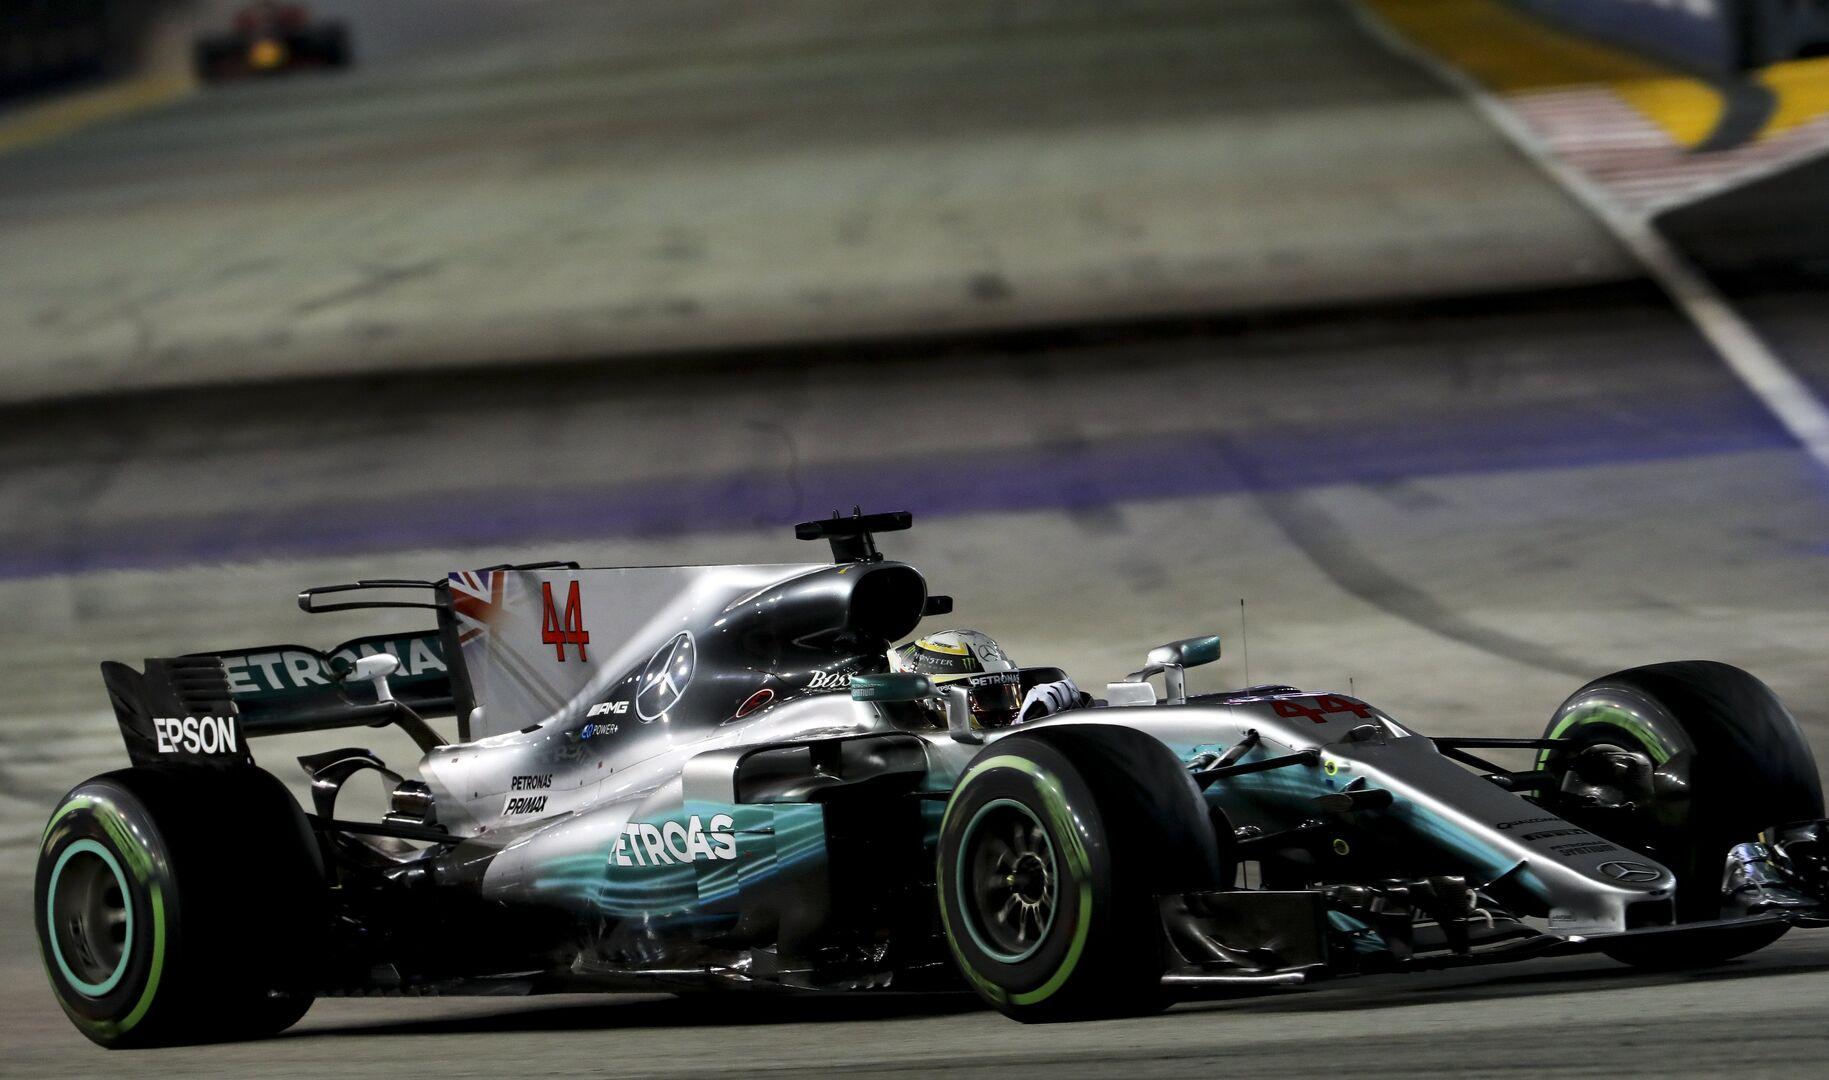 Circuito Singapur : Hamilton gana en marina bay alonso abandona y sainz termina cuarto